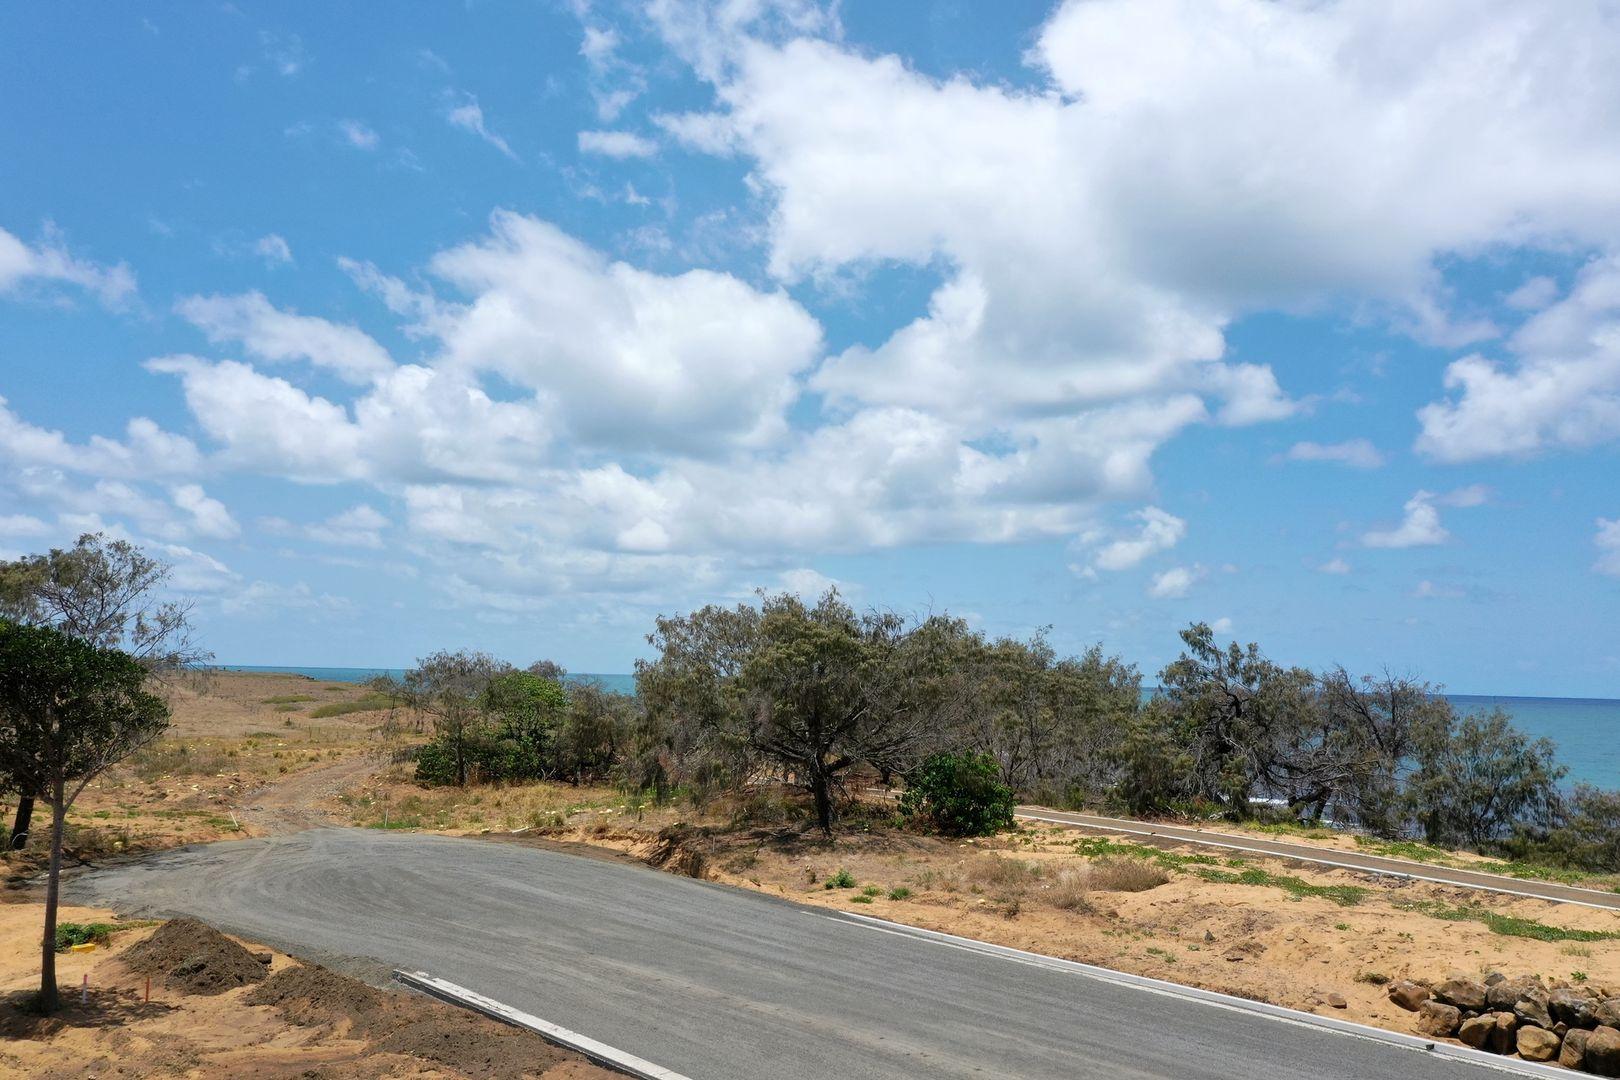 LOT 33 HEADLANDS ESPLANADE 'BARGARA HEADLANDS', Innes Park QLD 4670, Image 2